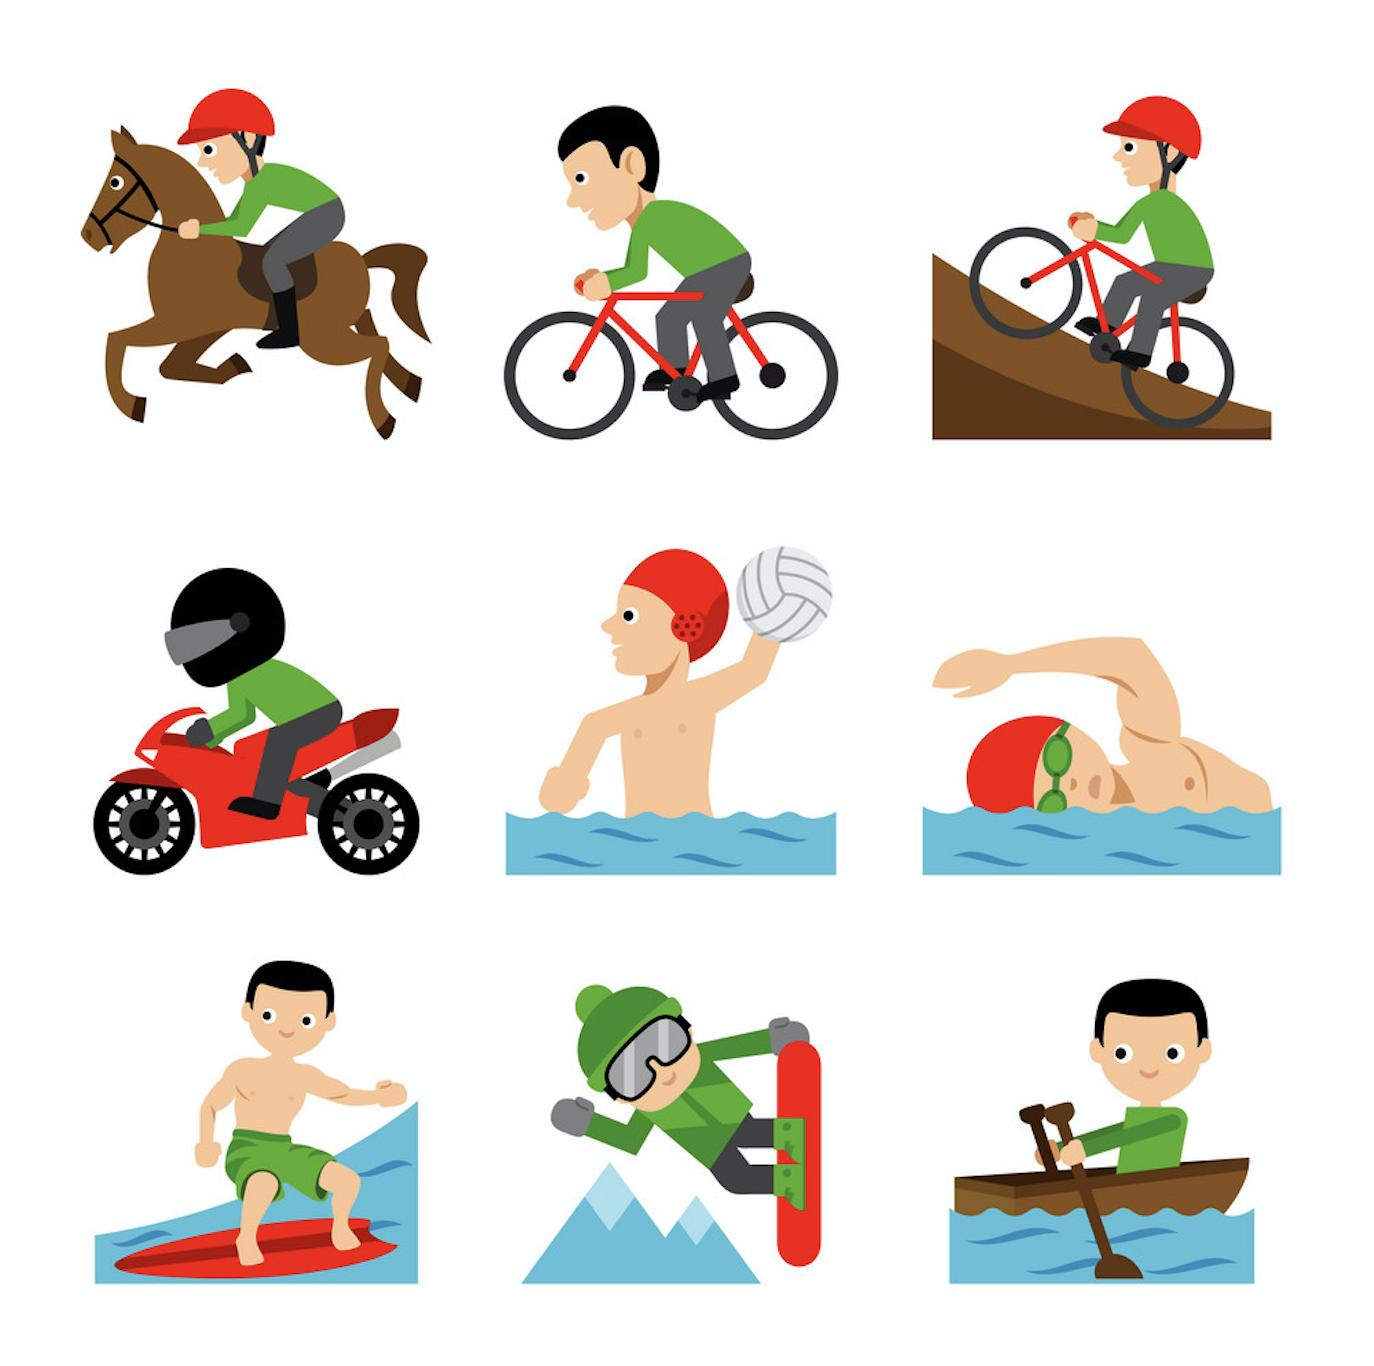 athlete-sport-man-character-cartoon-vector-20439937.jpg